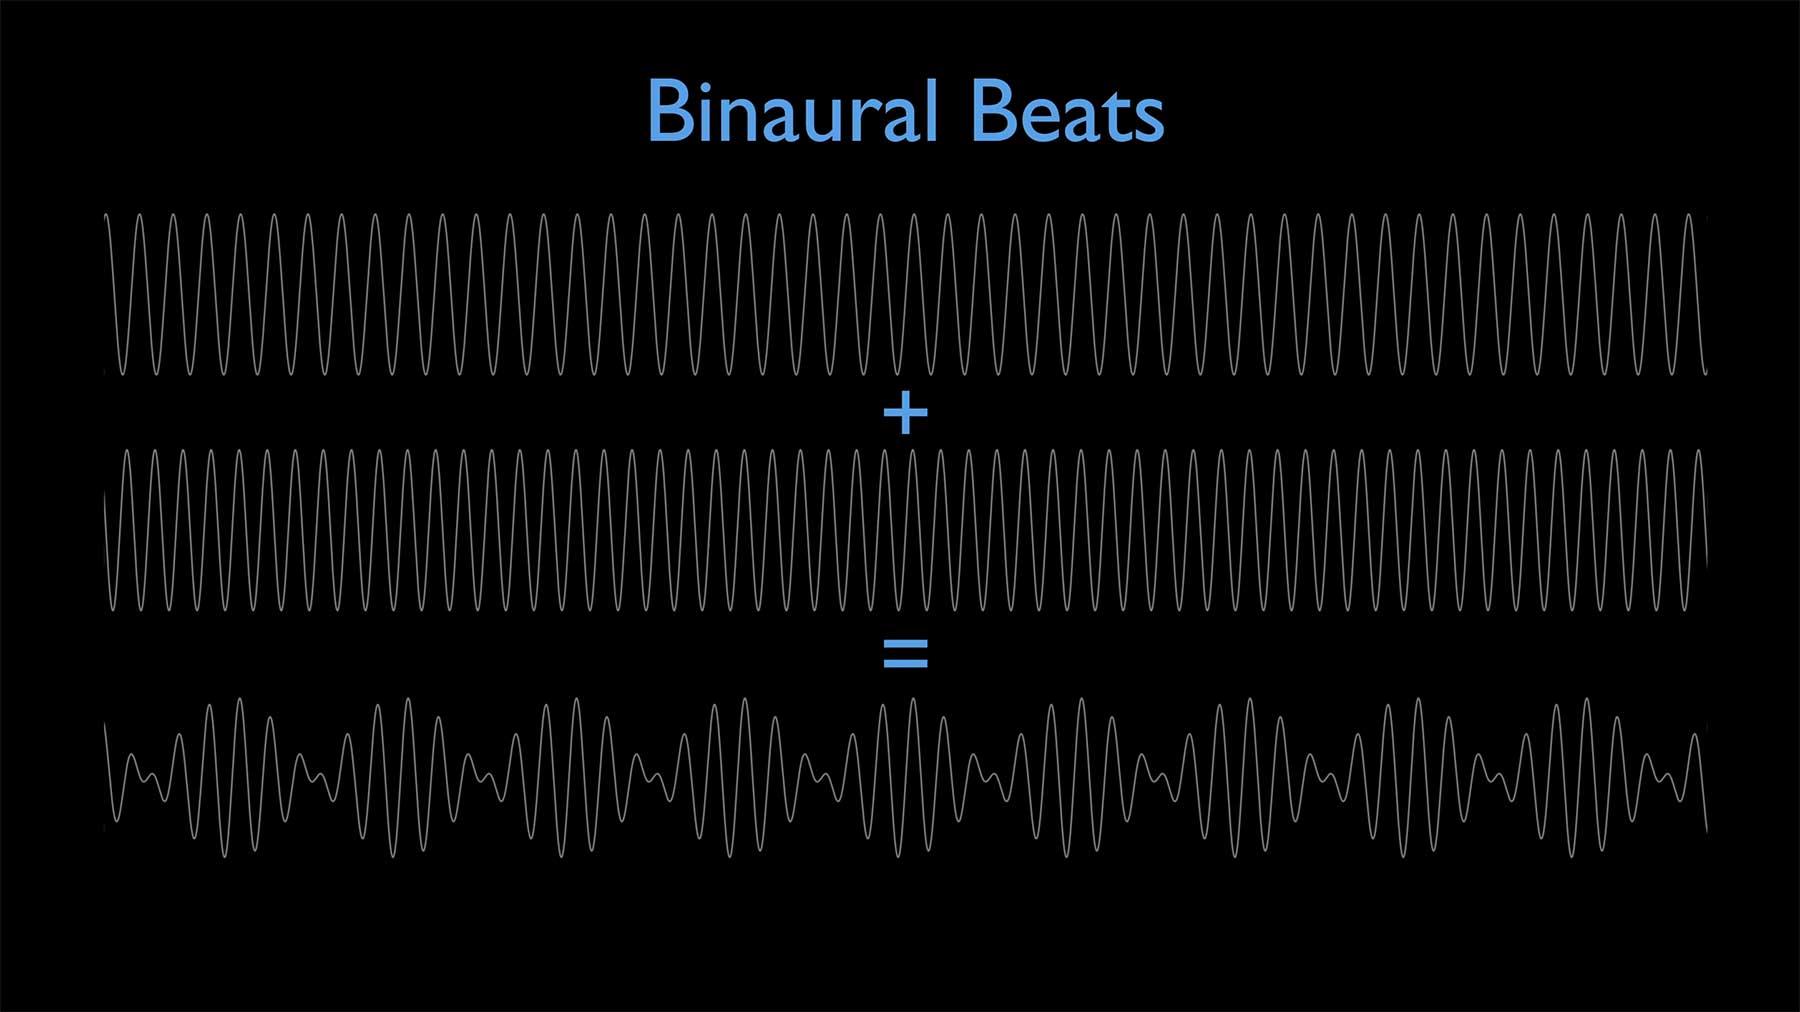 42 akustische Illusionen und Audio-Phänomene audio-illusionen-und-phaenomene